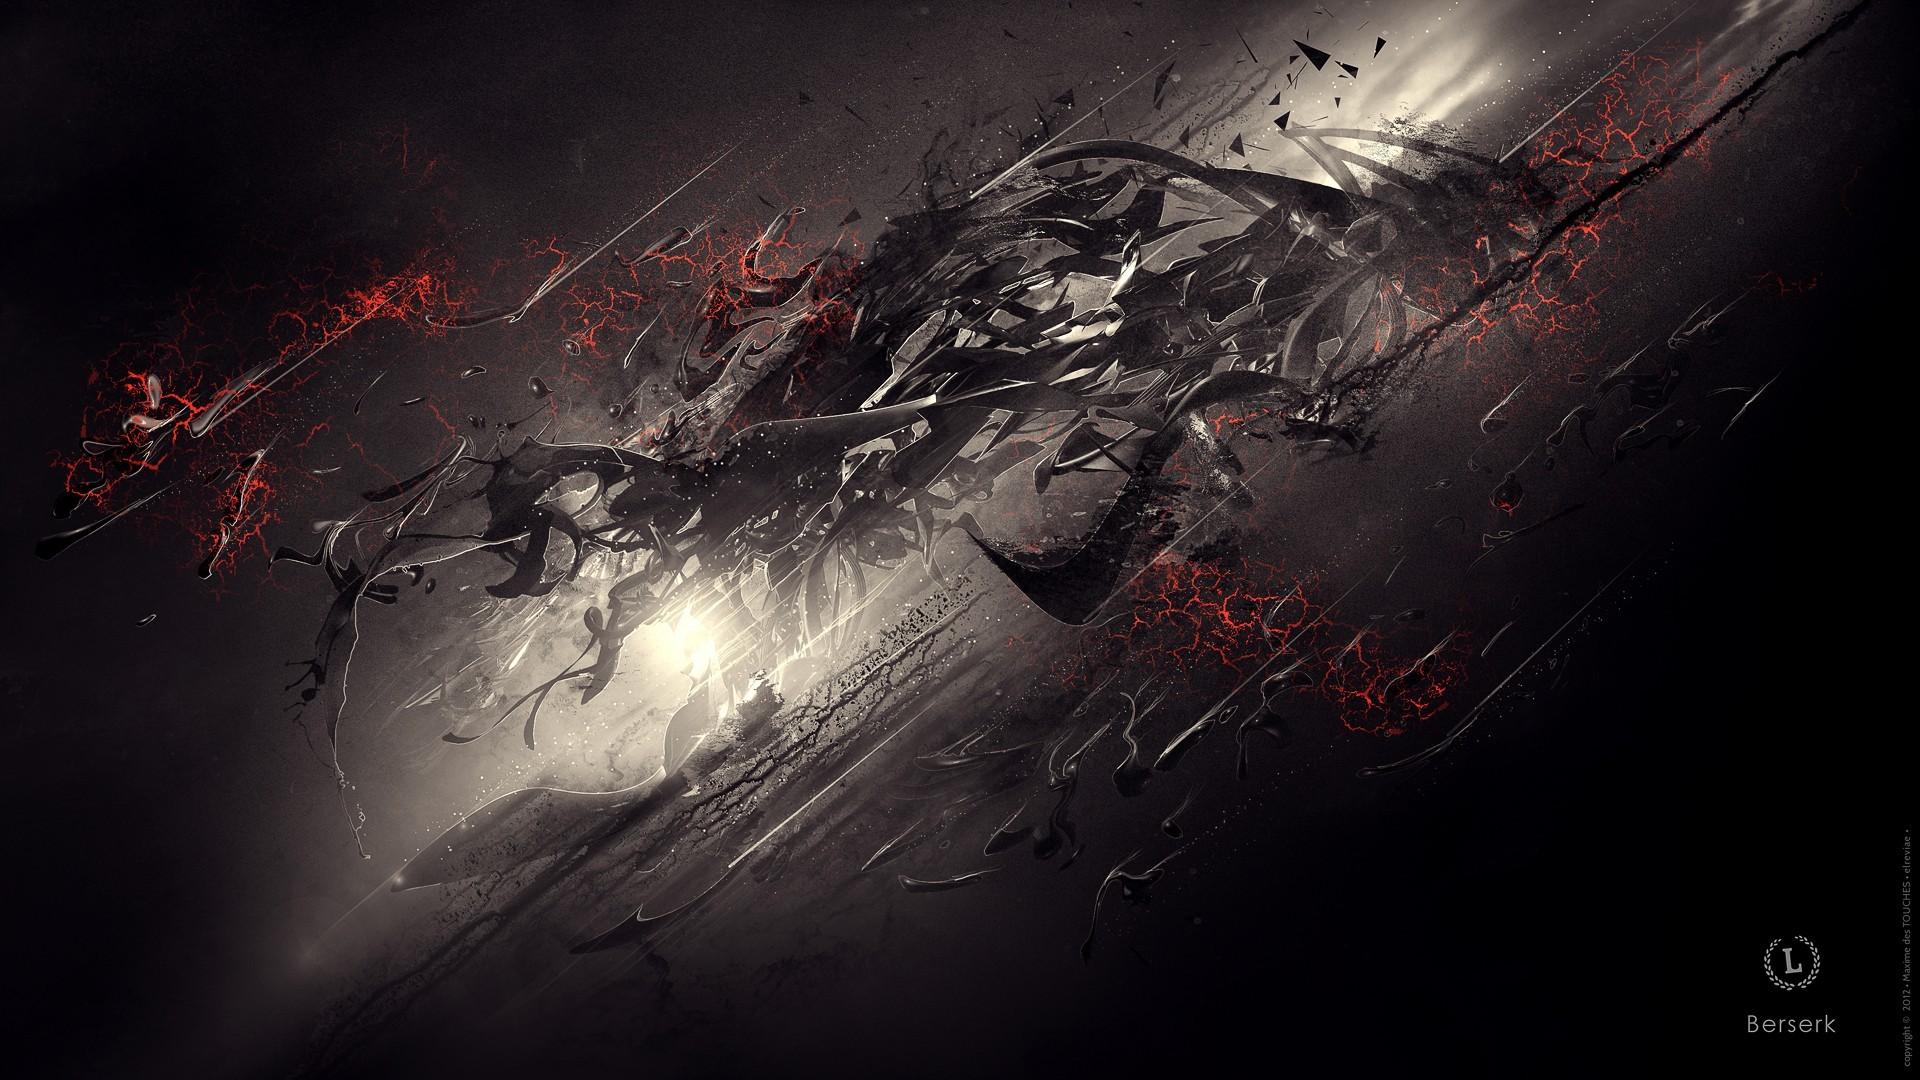 General 1920x1080 abstract digital art dark